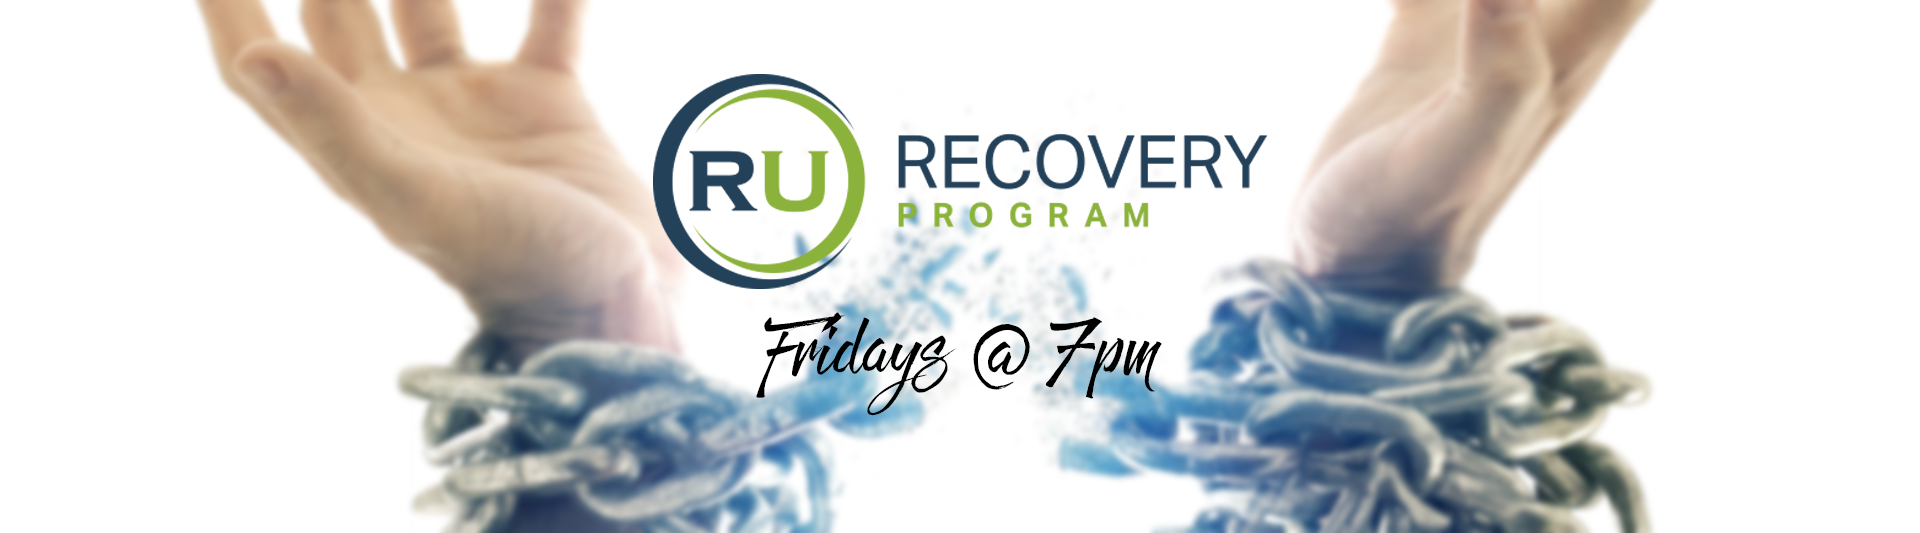 RU Recovery Program